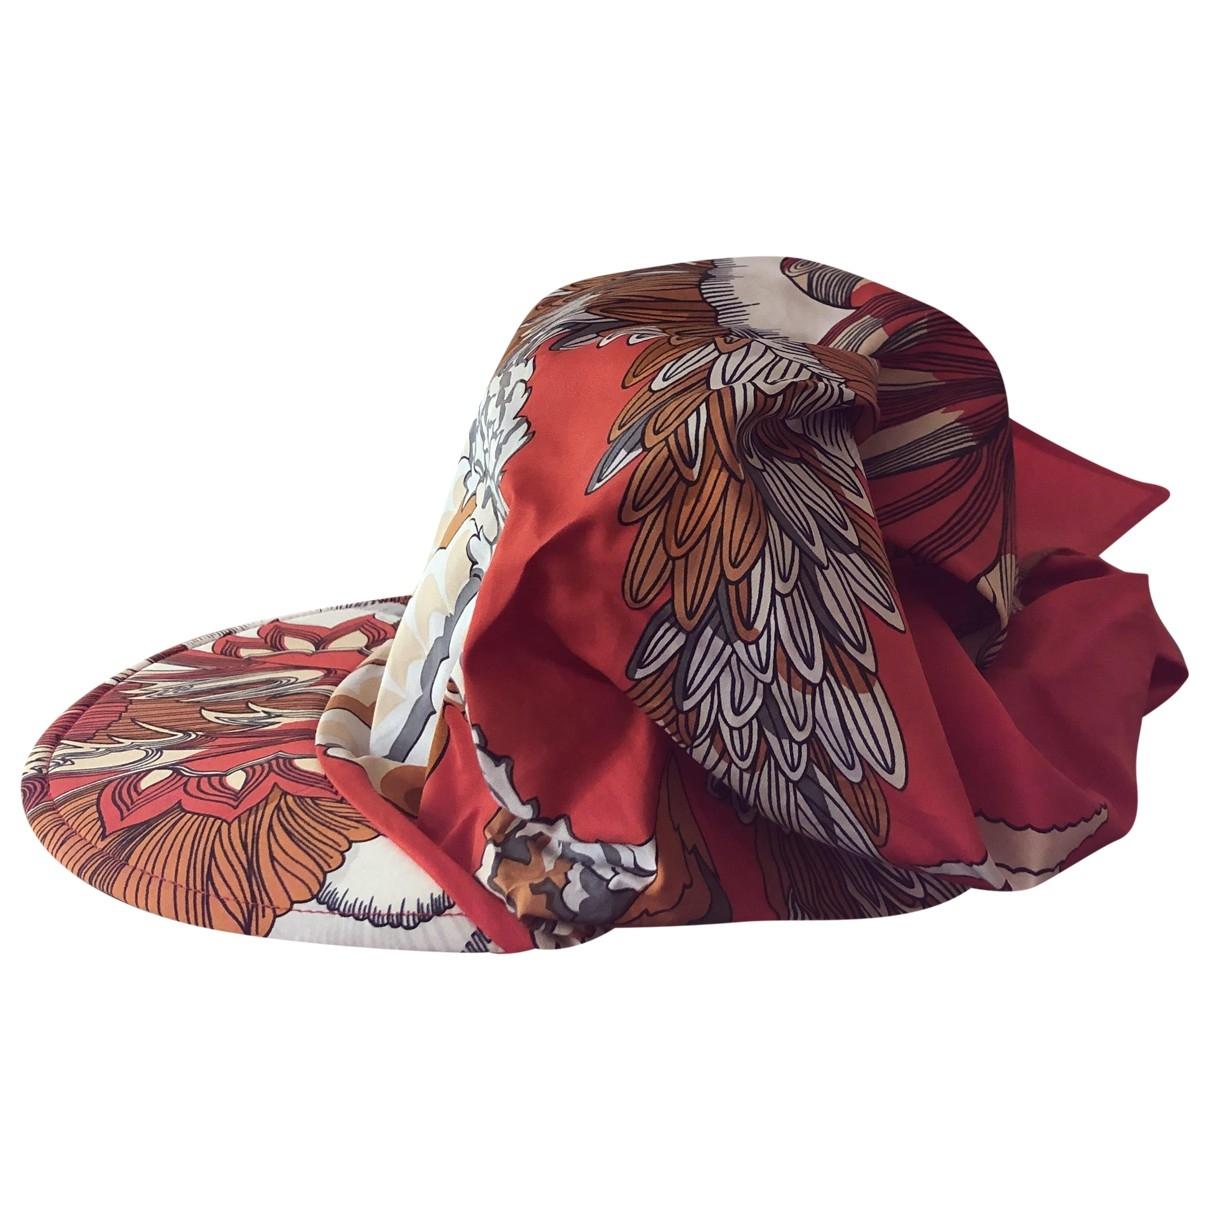 Hermès \N Orange Cotton hat for Women M International